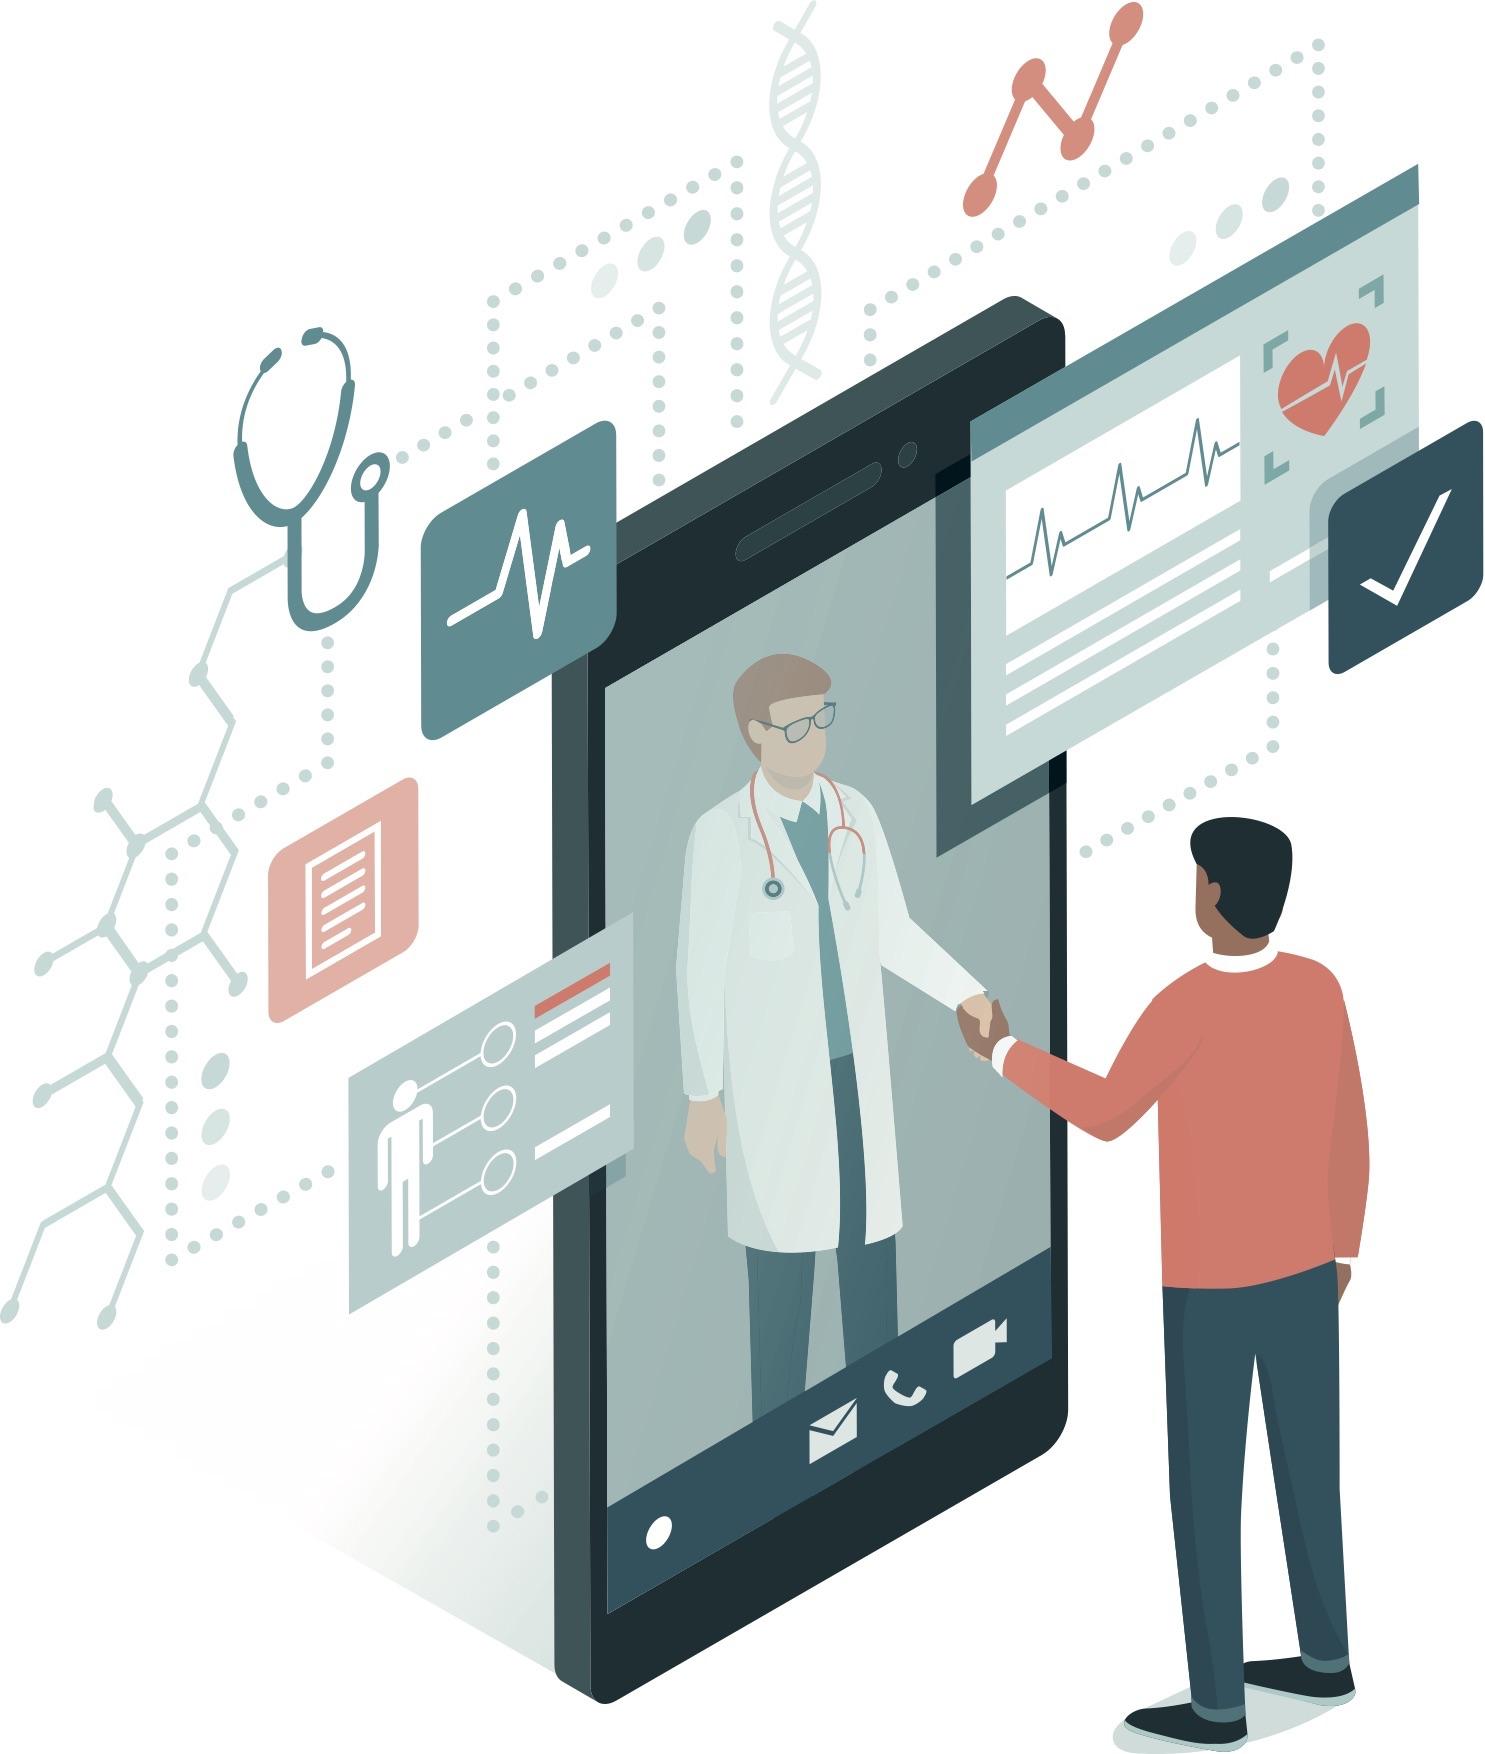 Video doctor